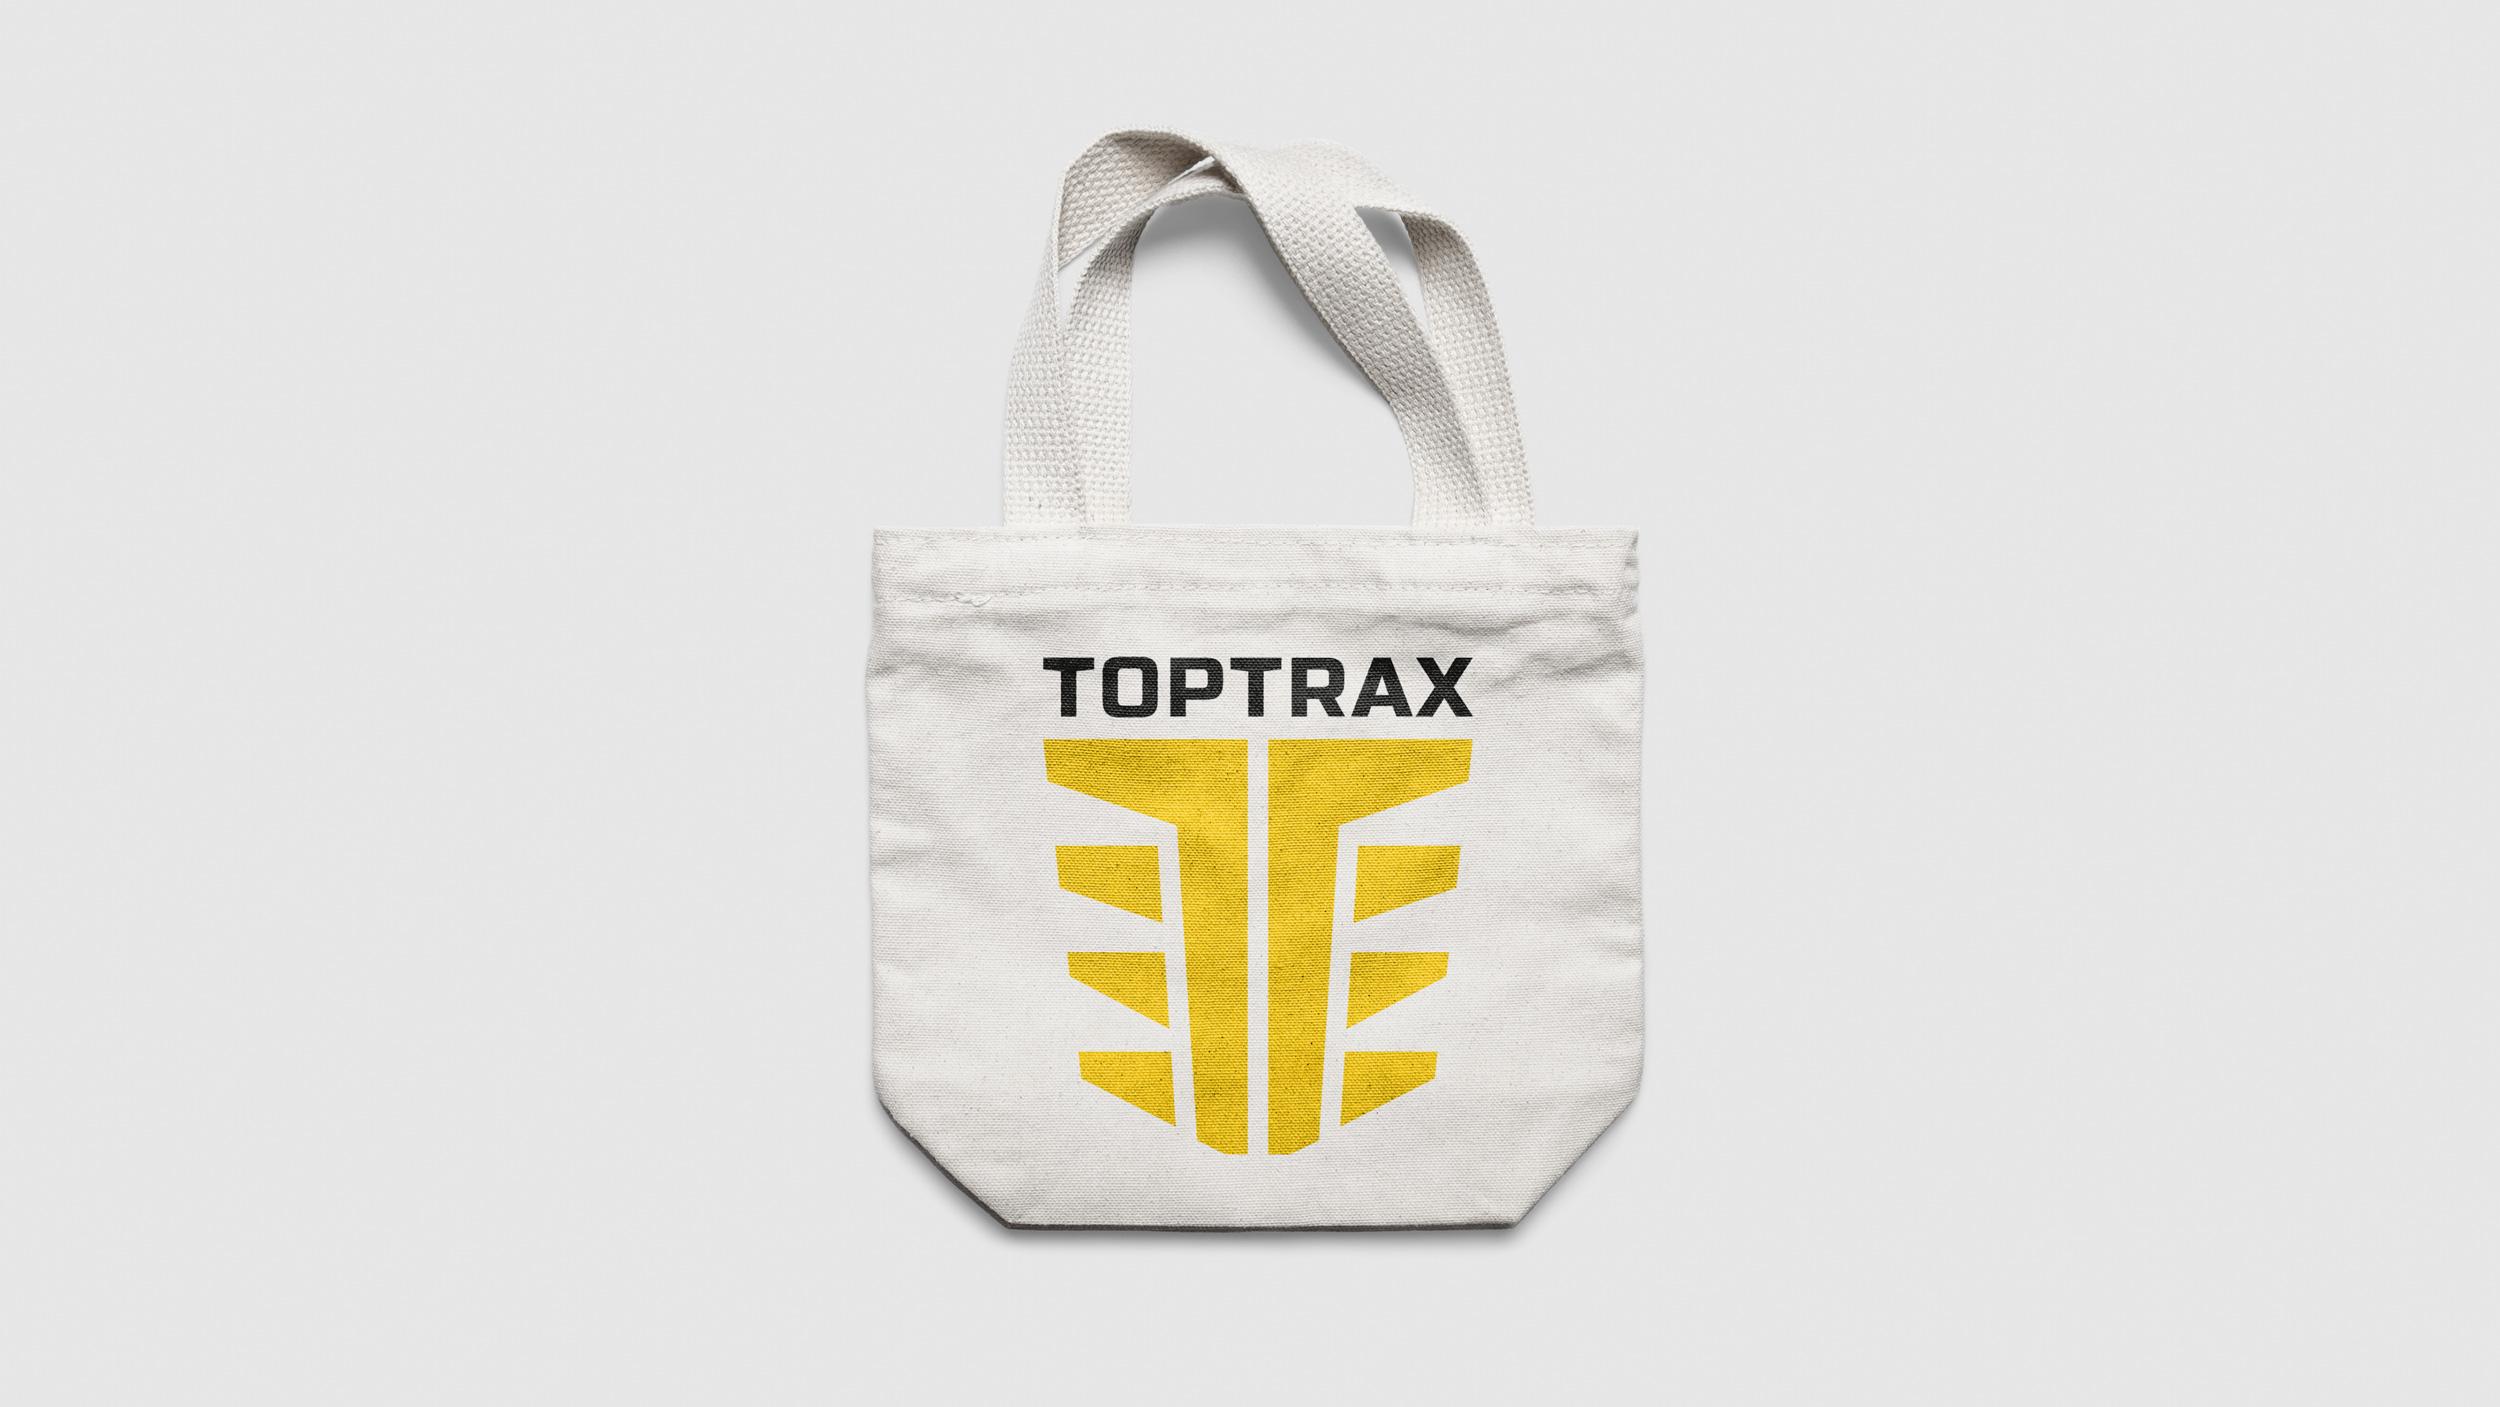 kamikaze-identidad-corporativa-toptrax-diseno-grafico-15